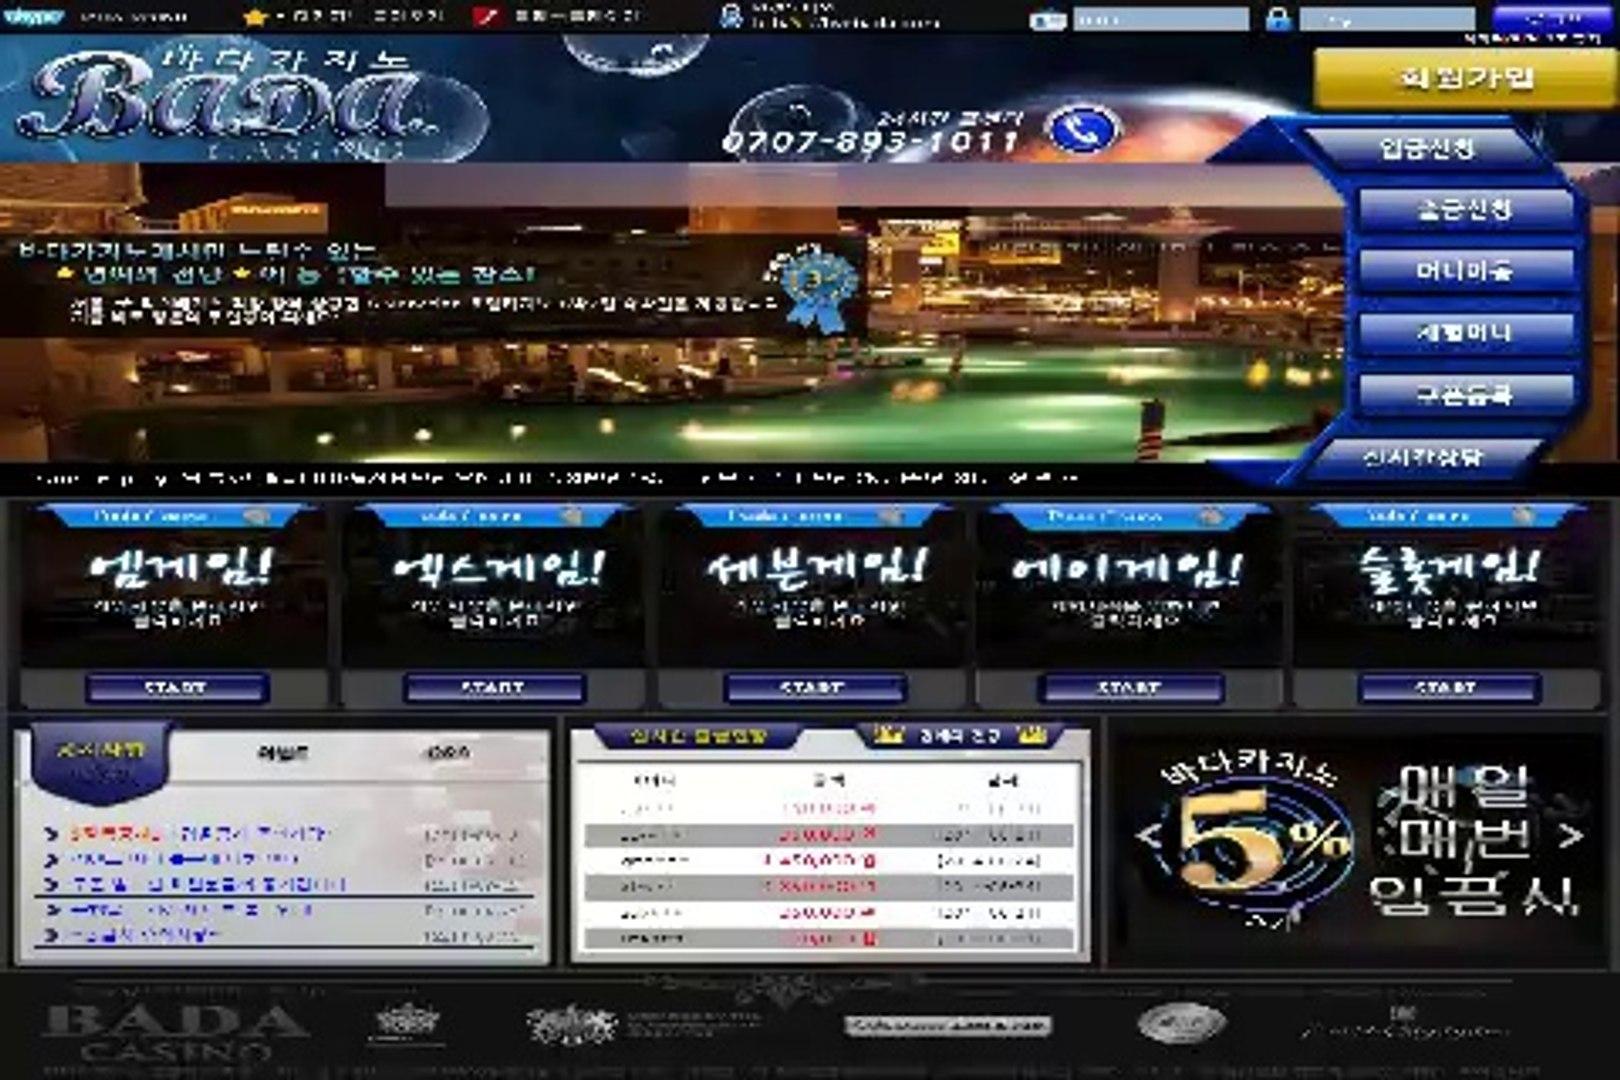 Euro palace casino download